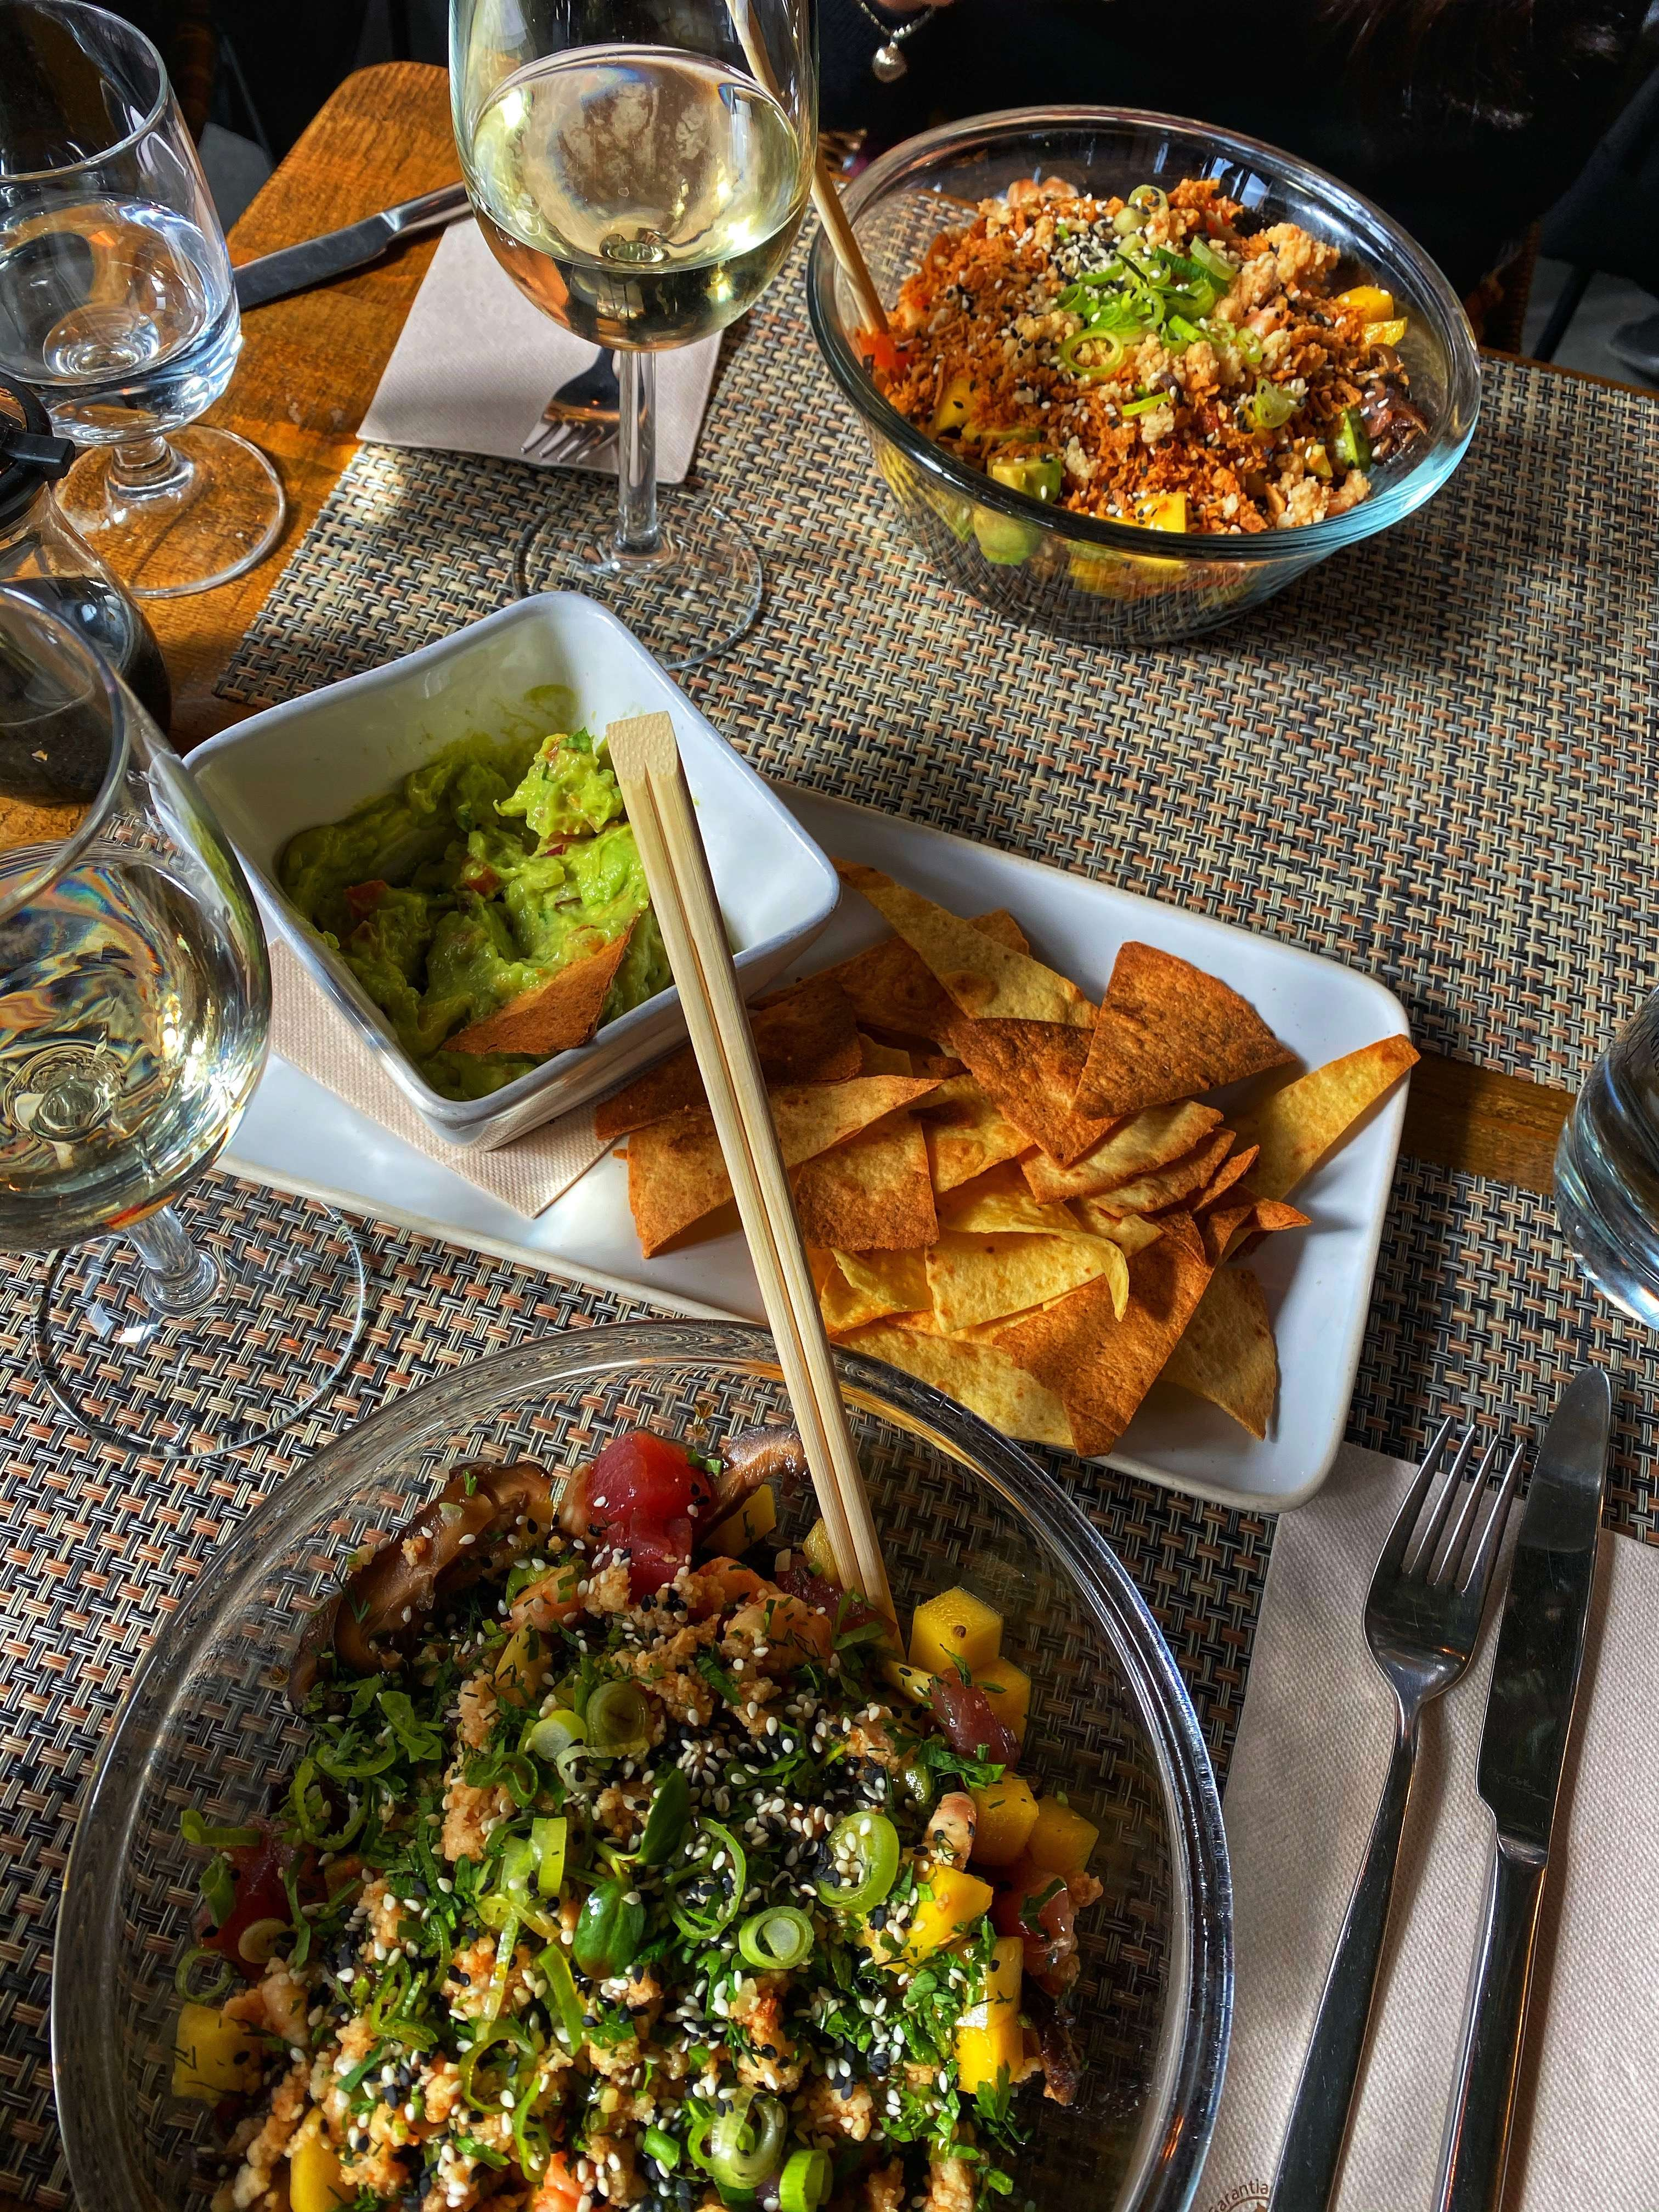 Local Avenida- Your Healthy Kitchen